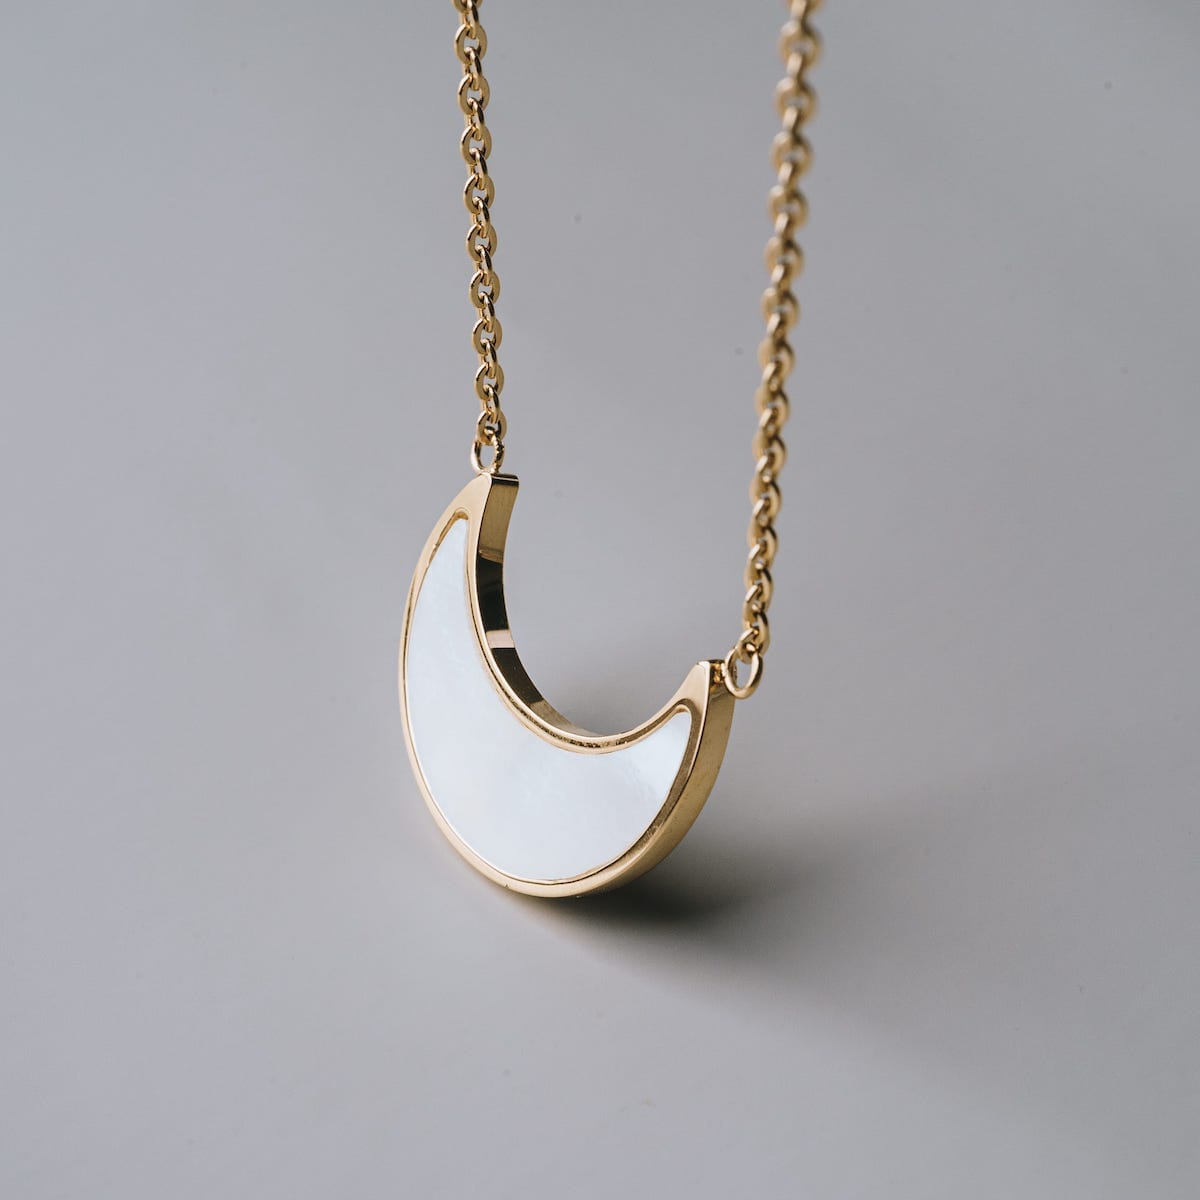 Hue necklace